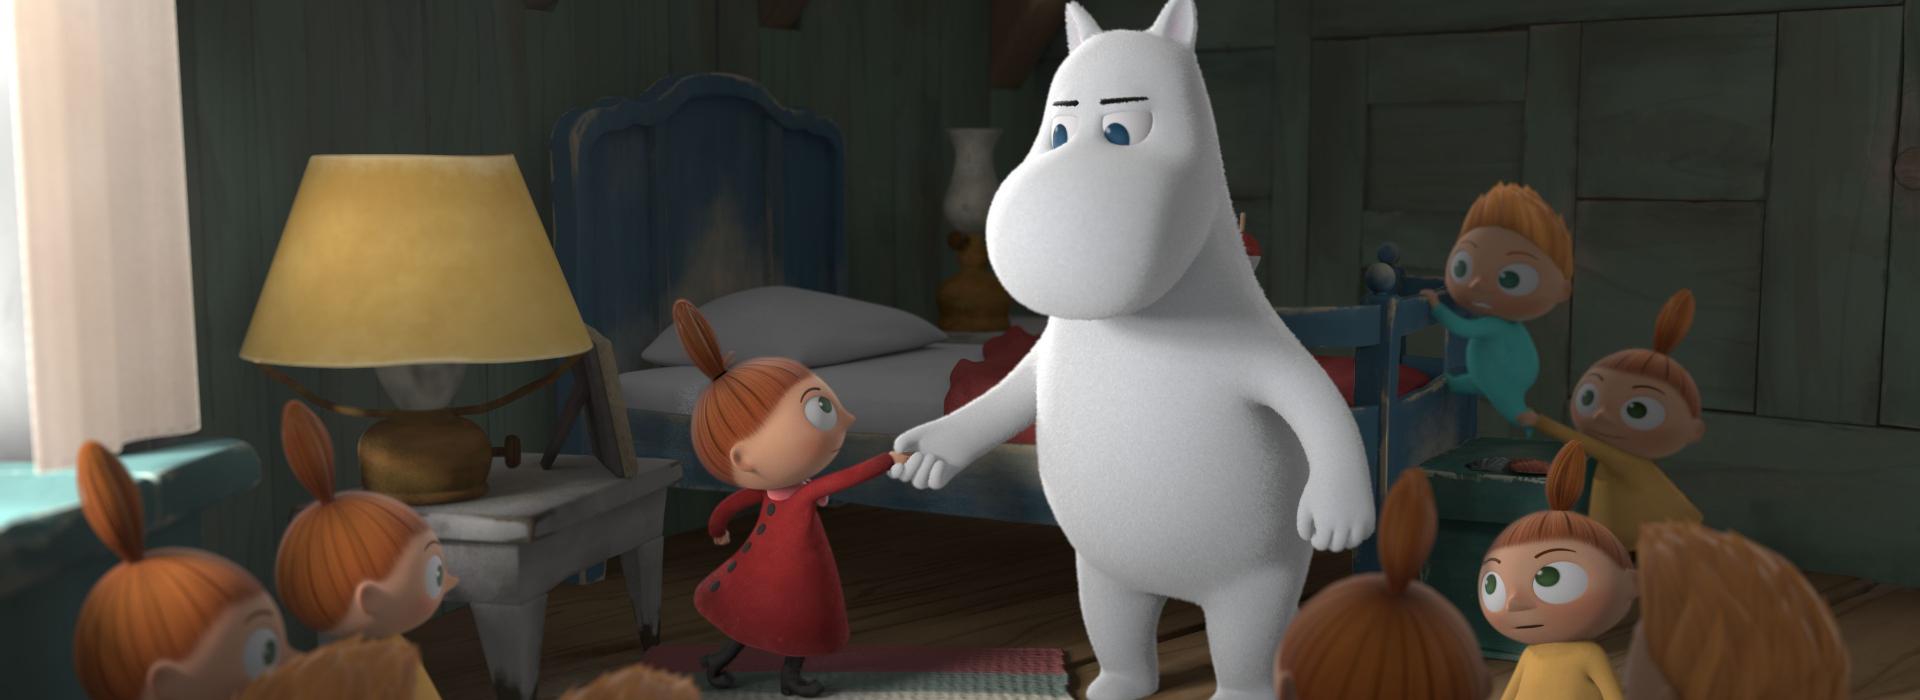 Moominvalley – PGS Entertainment